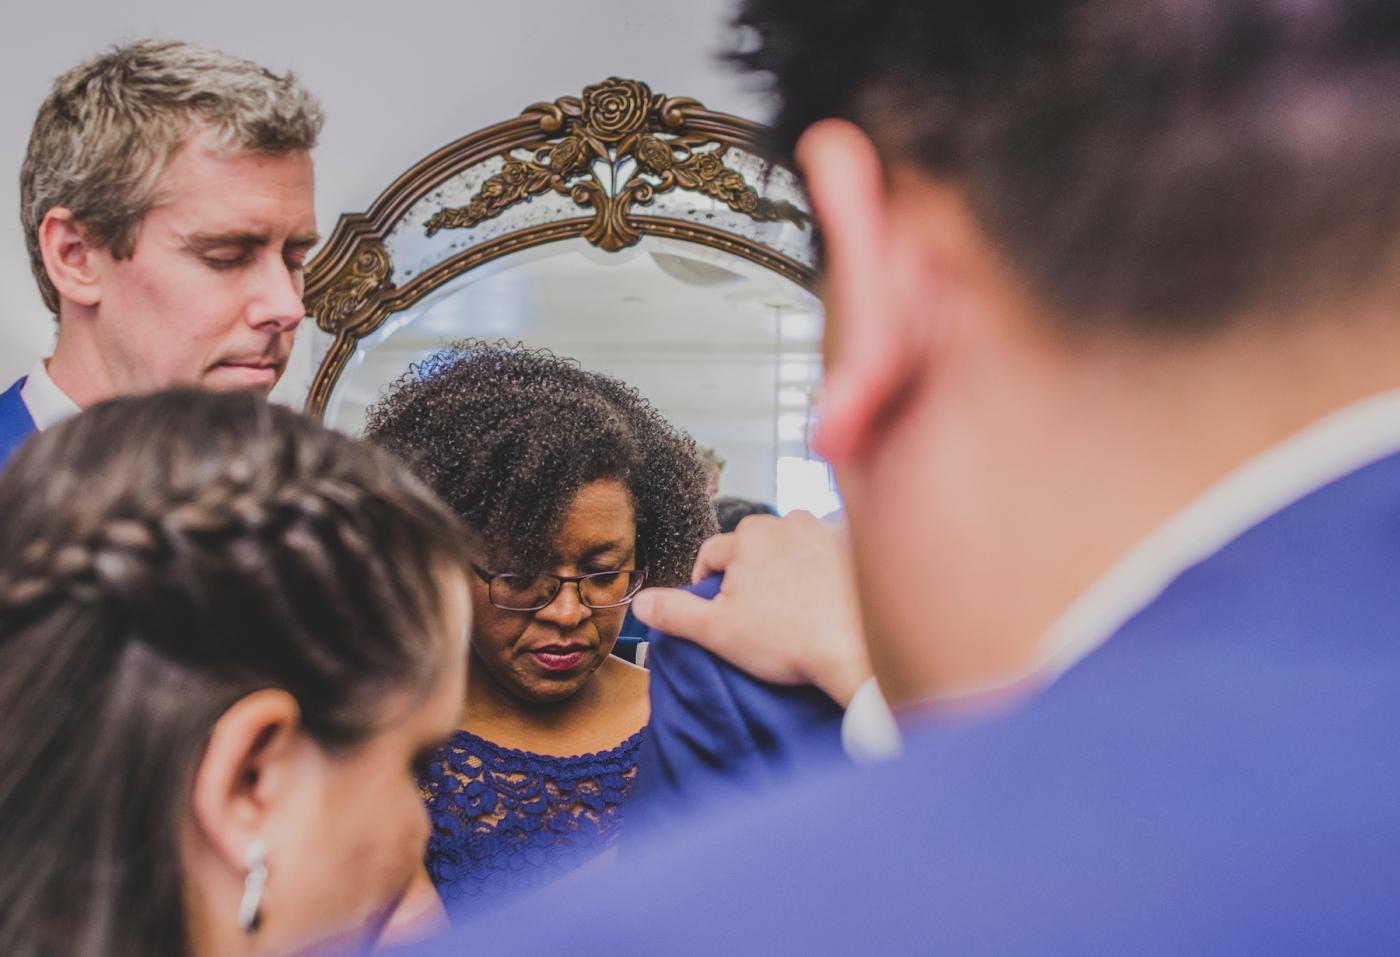 DSC_2394Everett_Wedding_Ballroom_Jane_Speleers_photography_Rachel_and_Edmund_Praying_2017